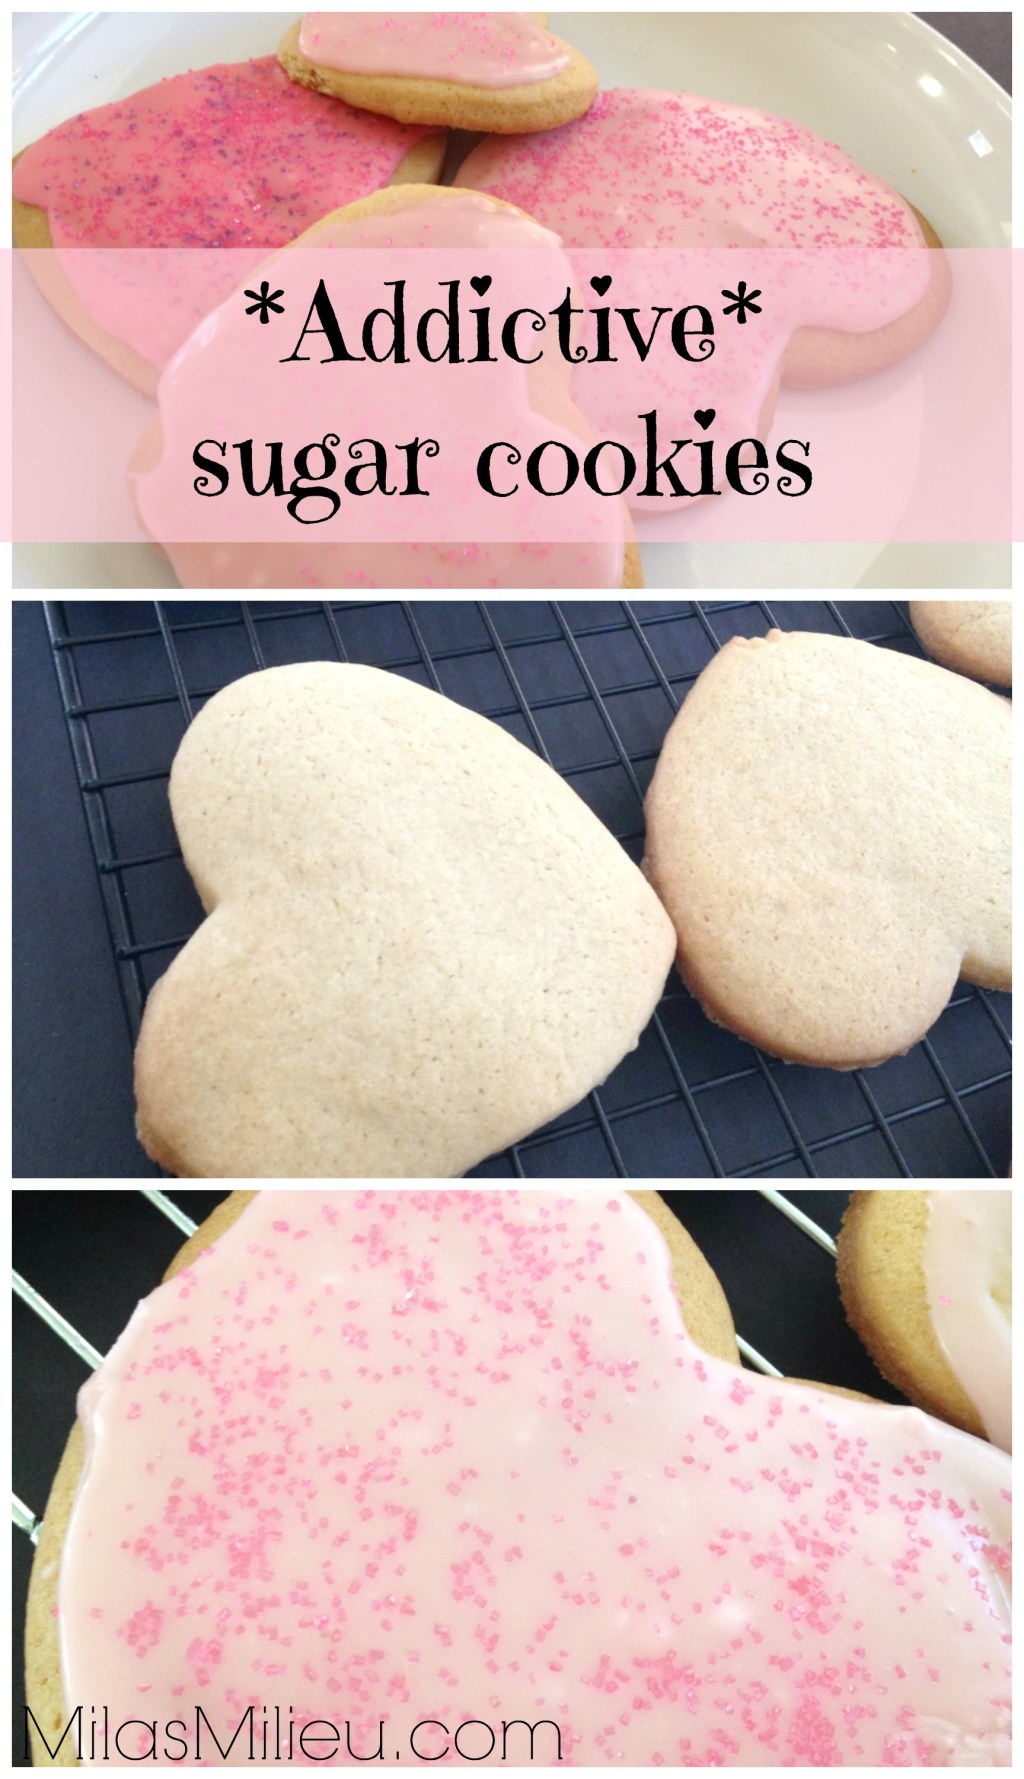 Classic roll-out sugar cookies via milasmilieu.com